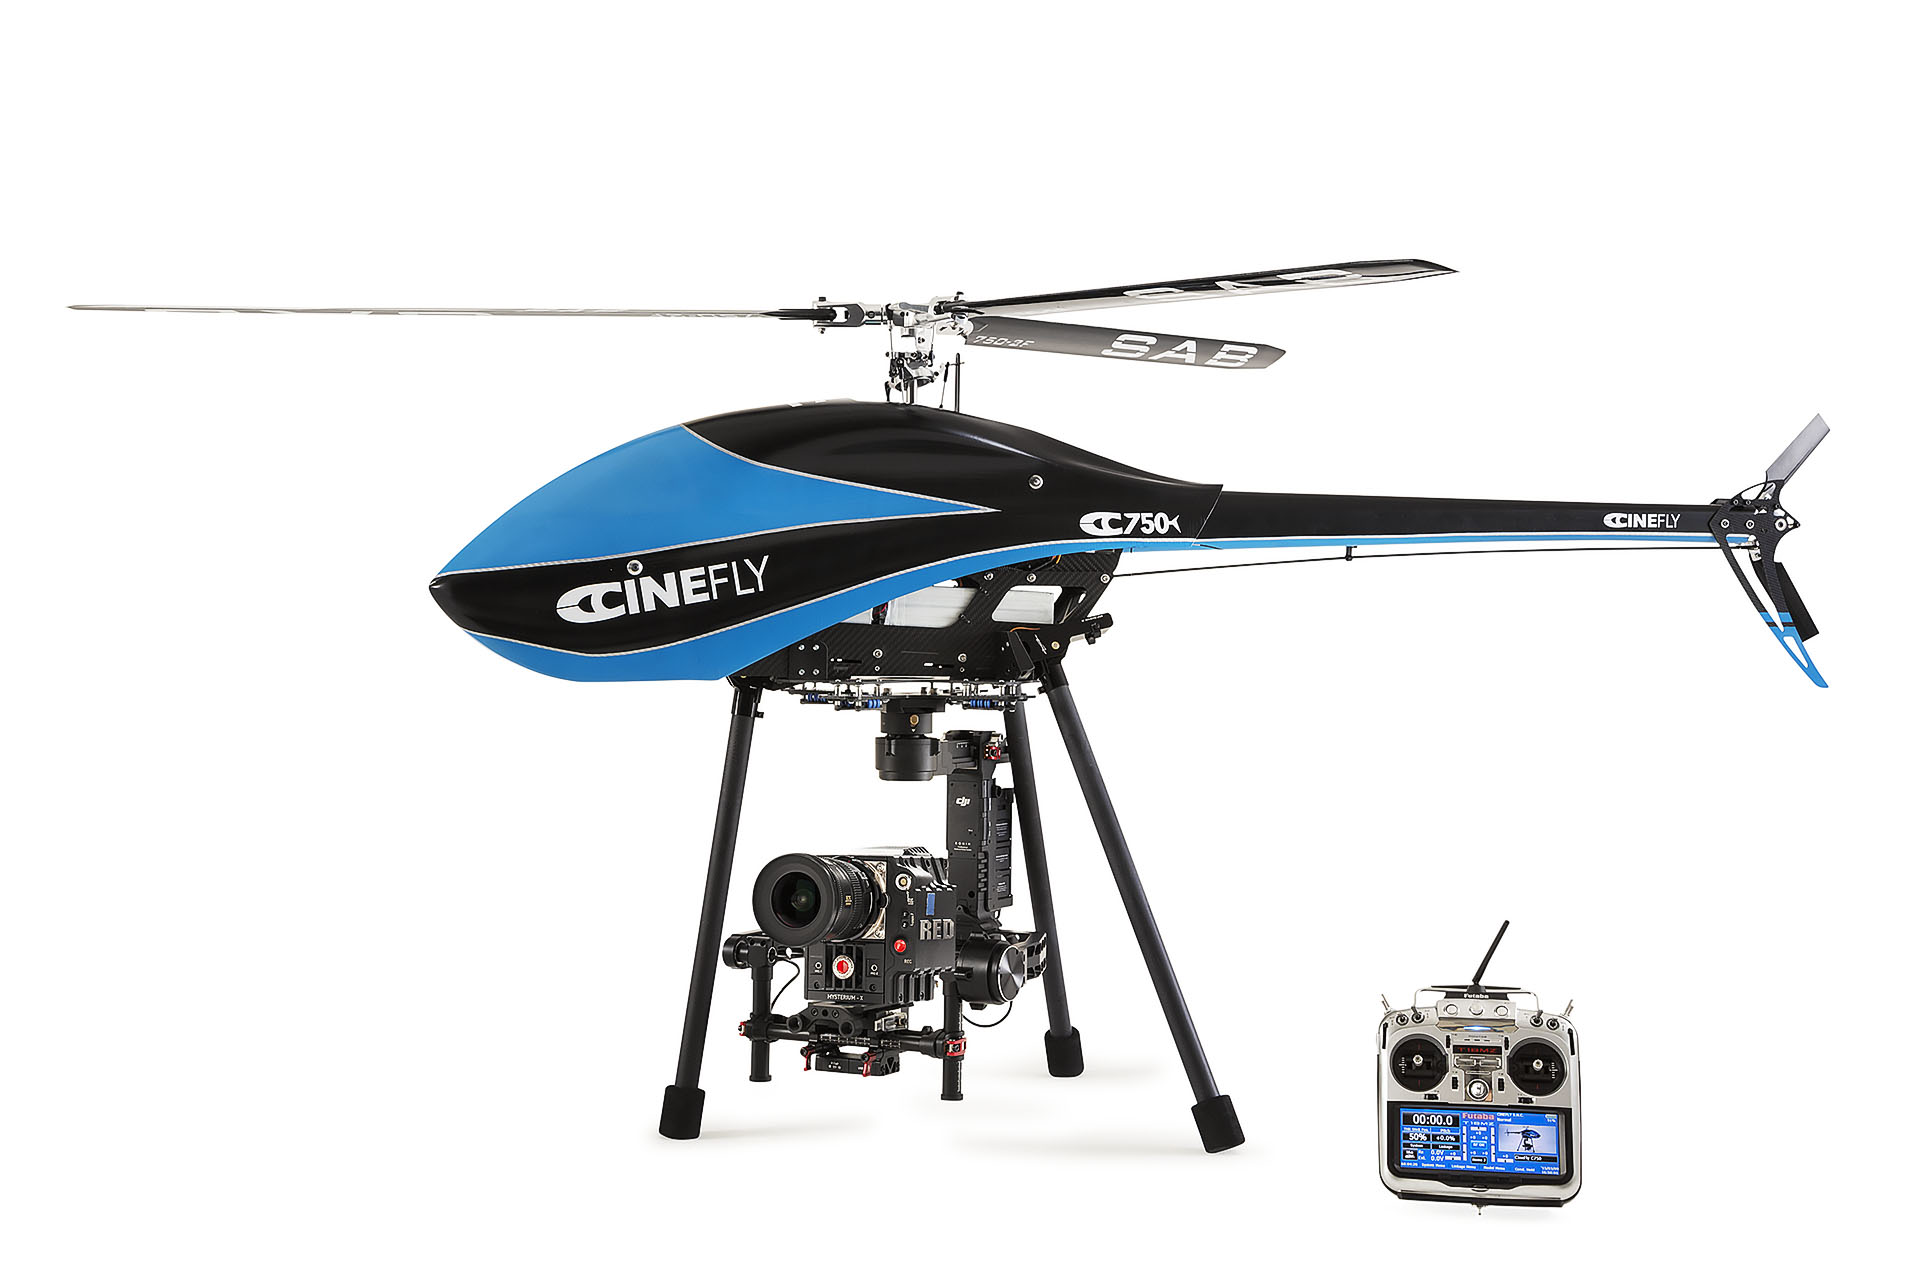 C750-Cinefly-Drone-Cinema